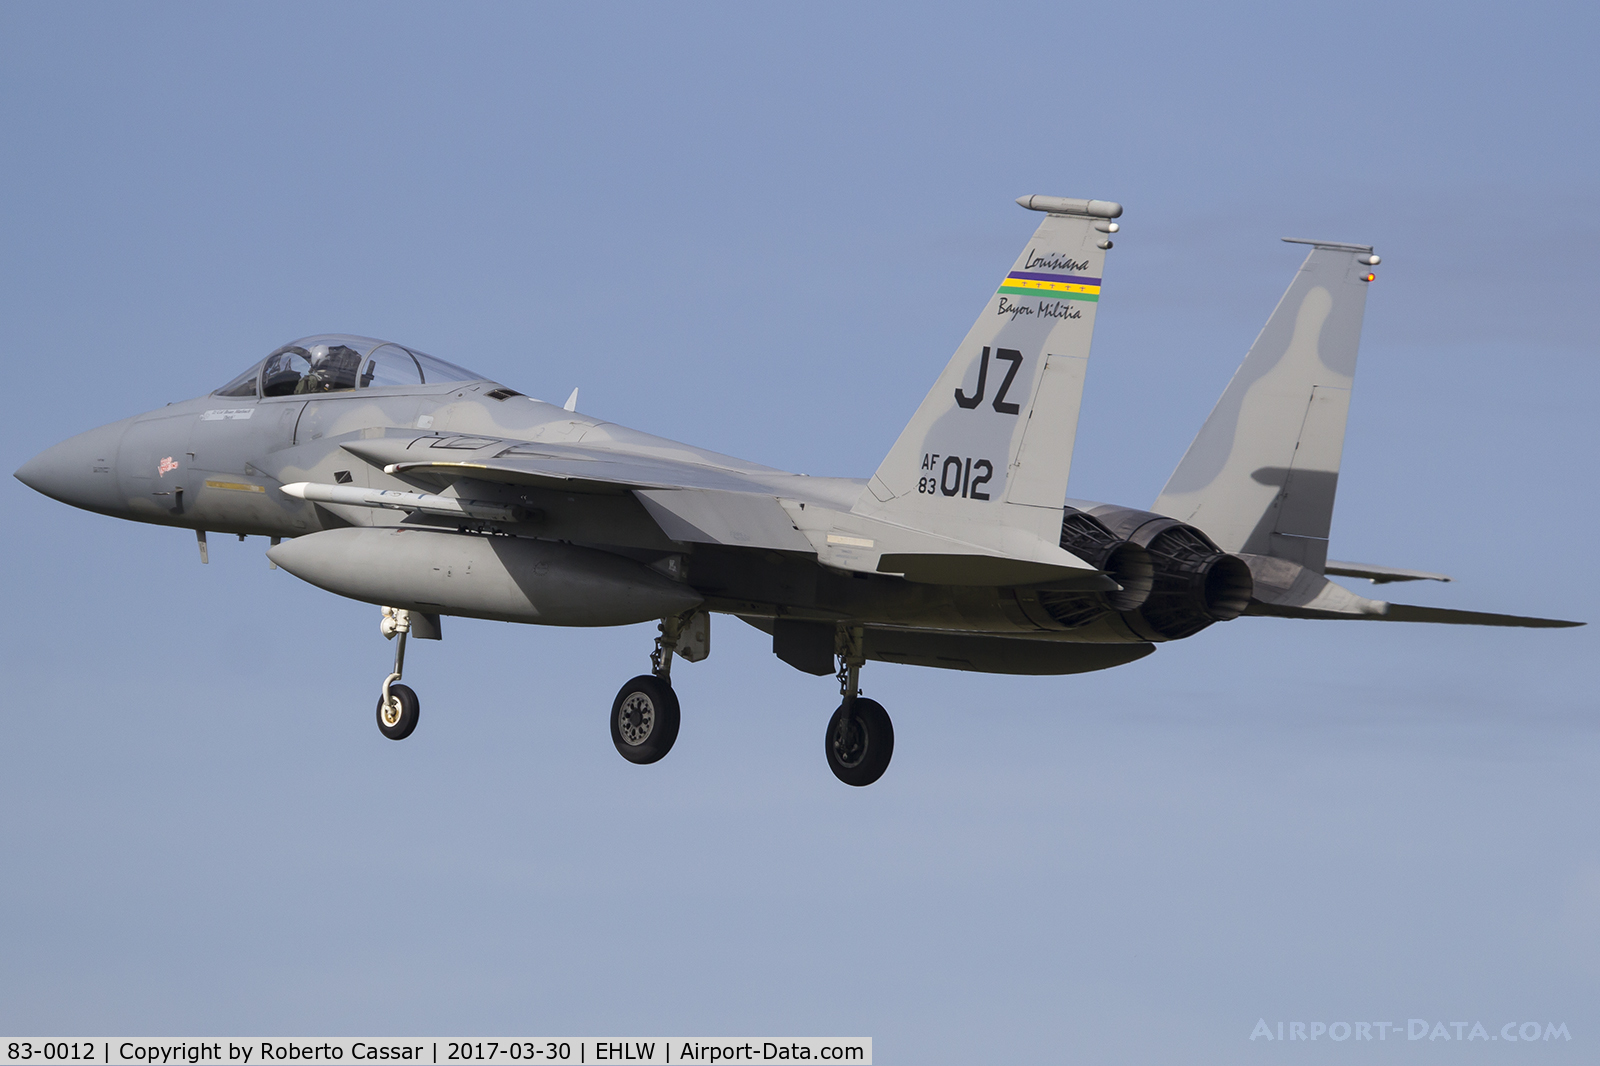 83-0012, 1983 McDonnell Douglas F-15C Eagle C/N 0858/C272, Frisian Flag 2017